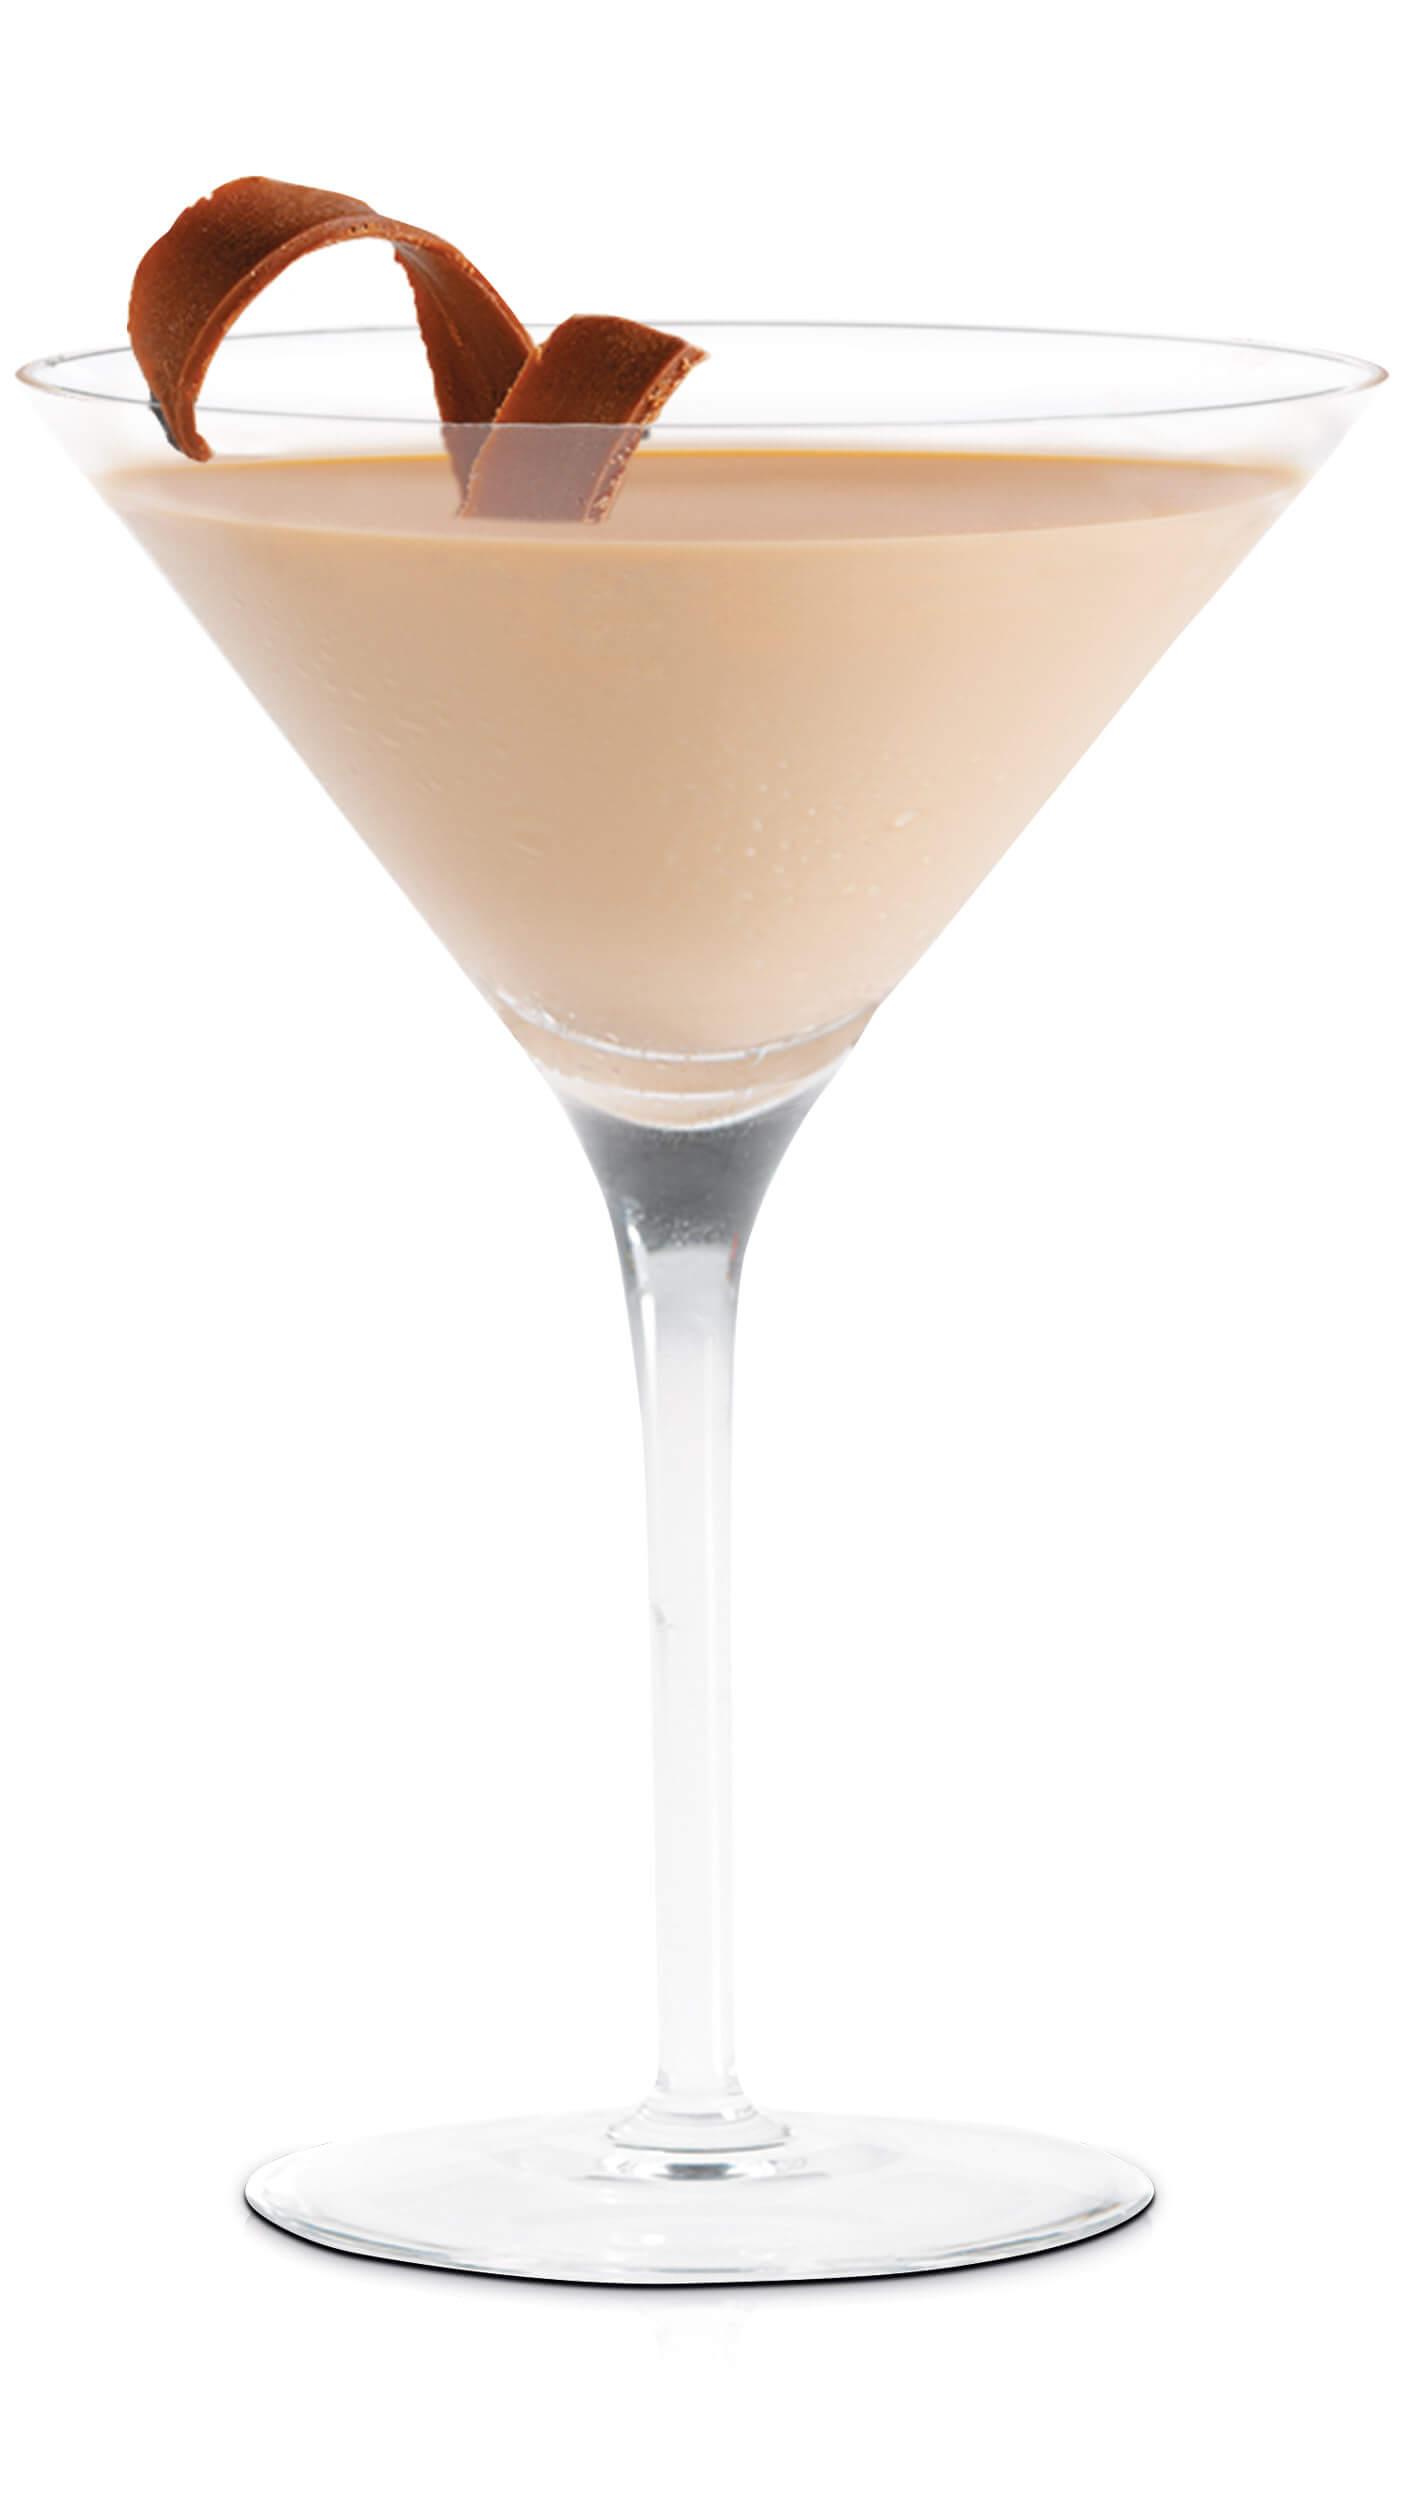 Chocolate cherry martini with EFFEN Black Cherry Vodka: Creme de Cacao and Maraschino cherries.